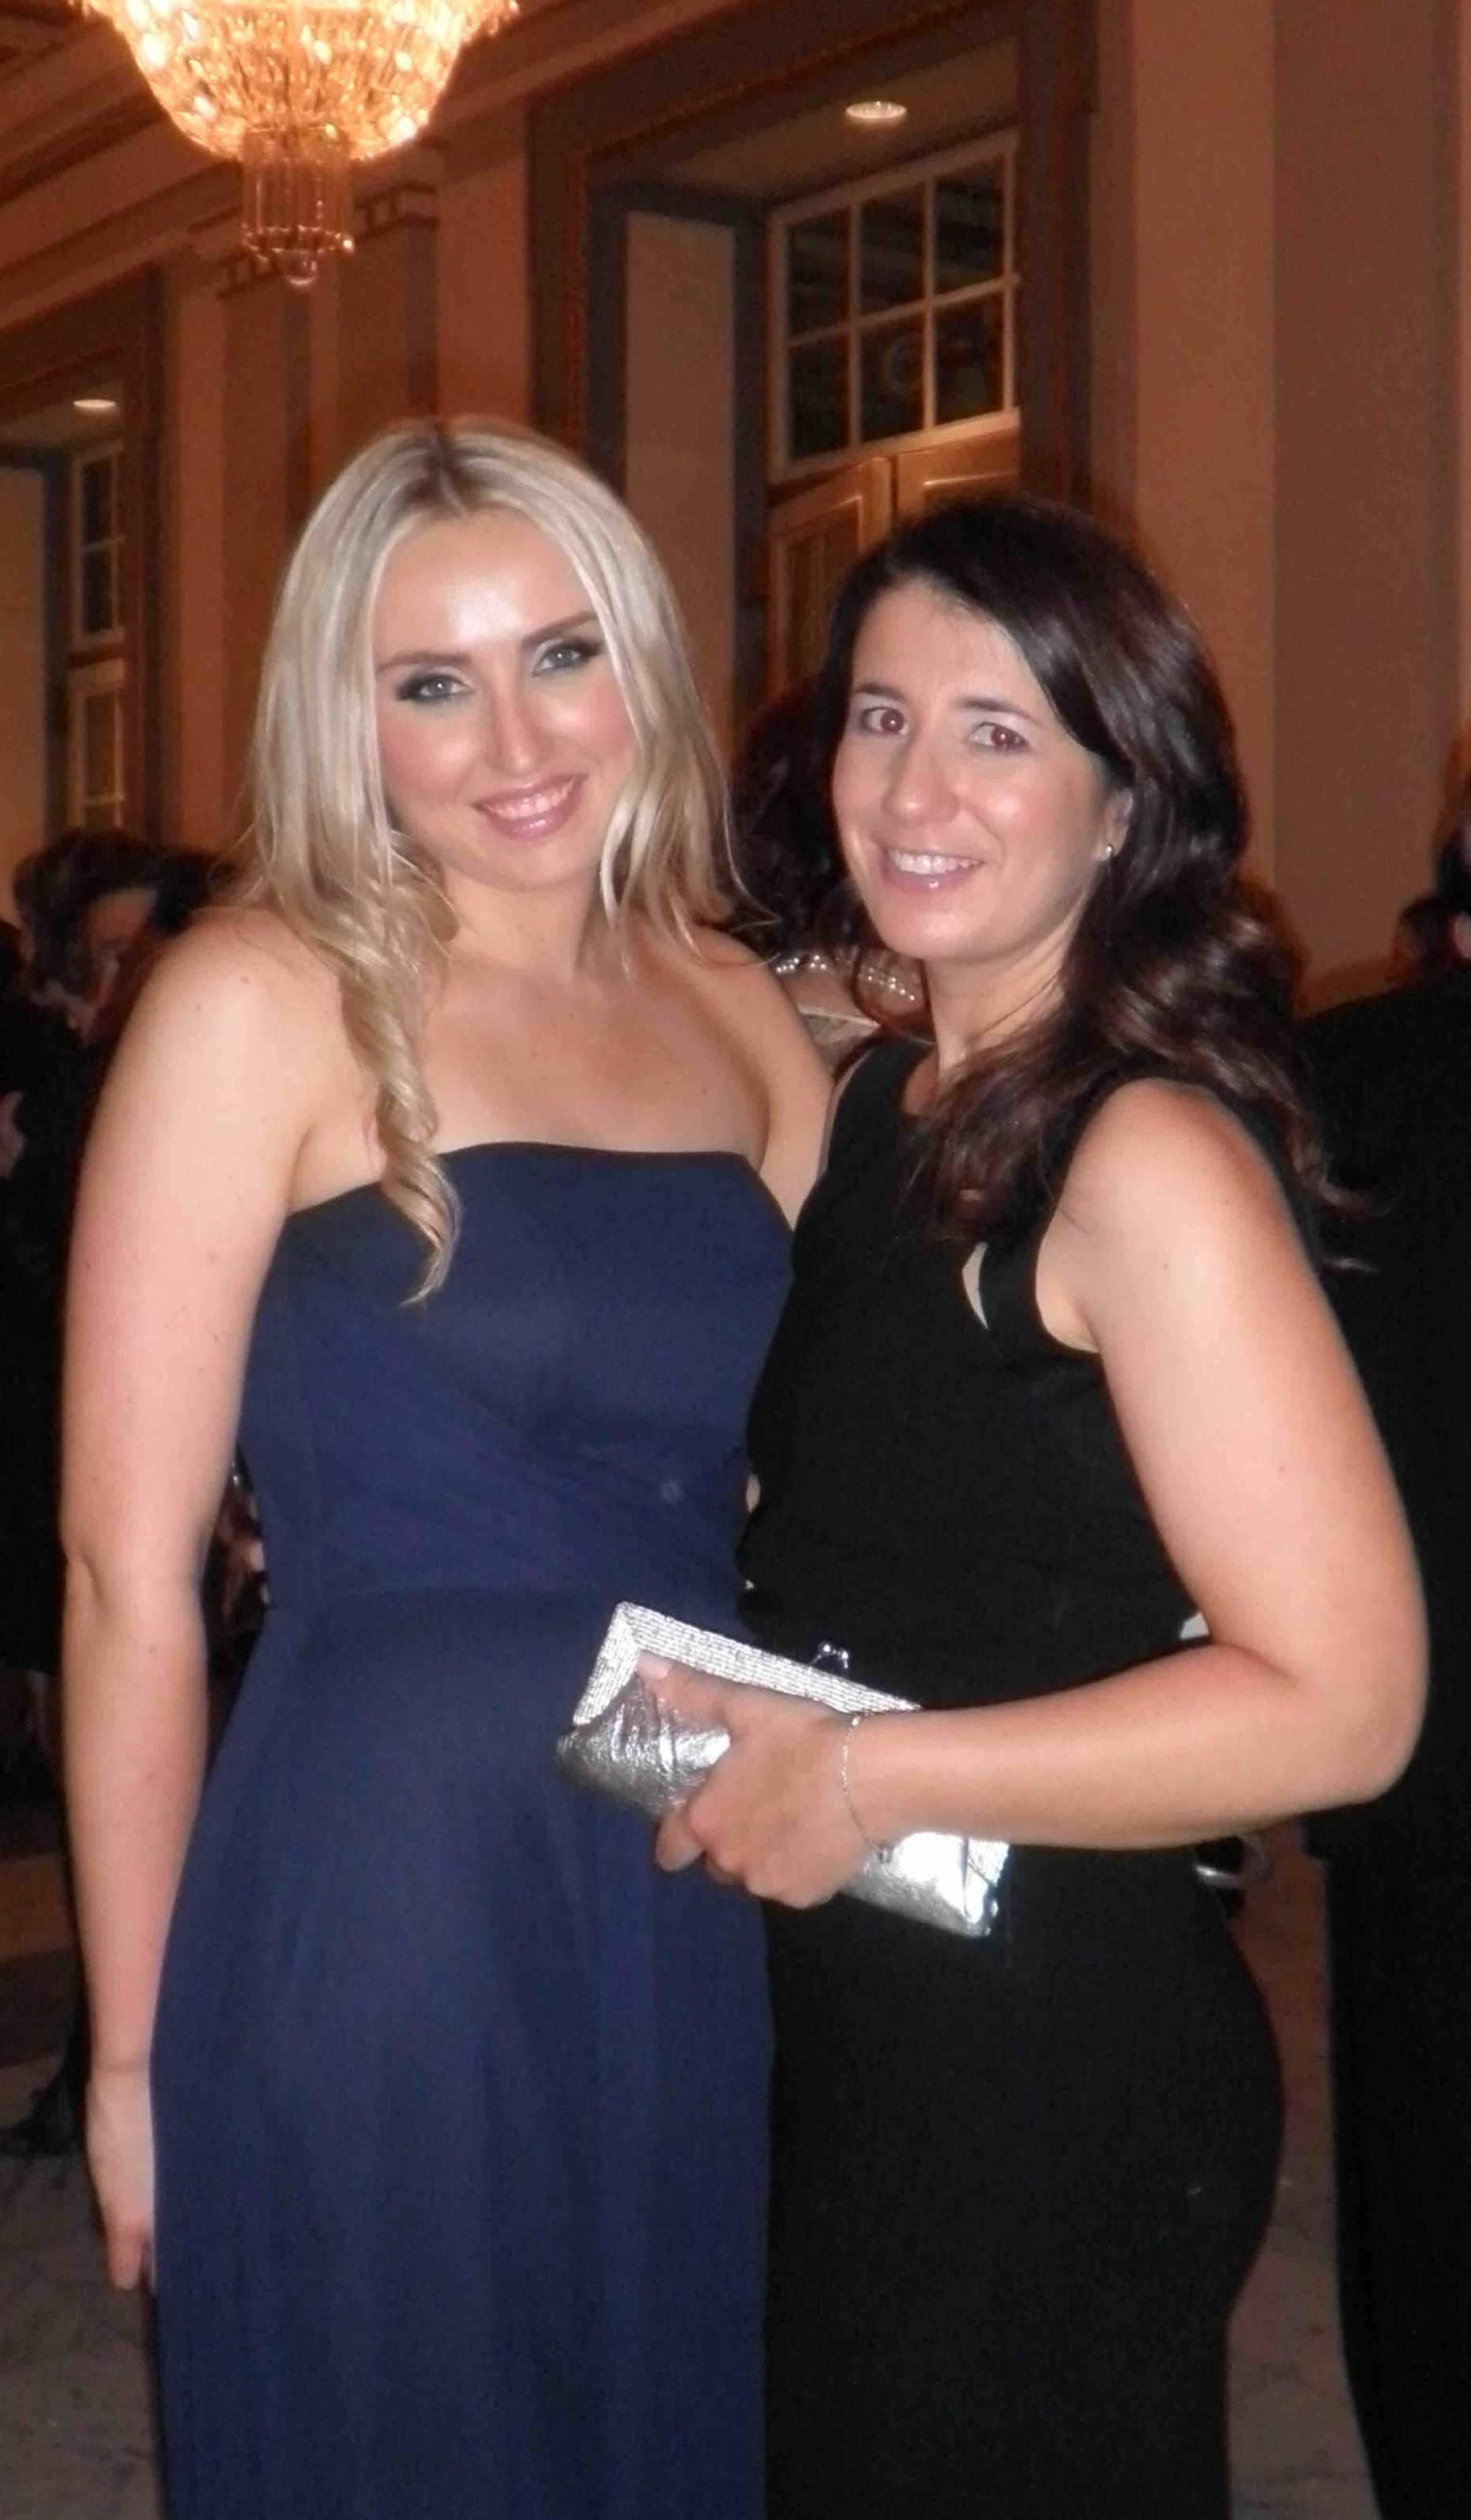 Samantha Curtis and Sabine Ducroux